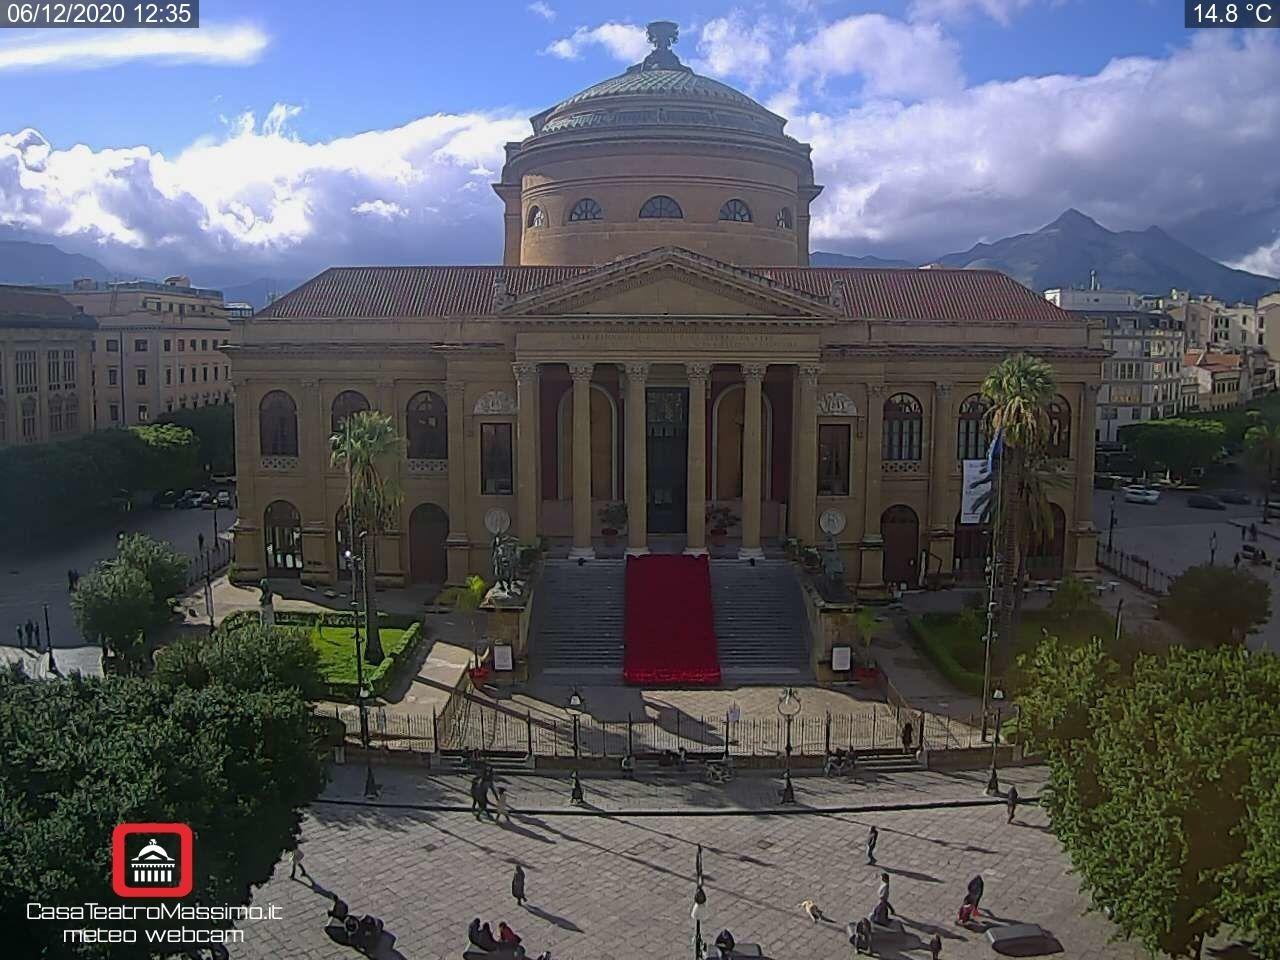 Photo By: Casa Teatro Massimo; desc: Palermo; licence cc